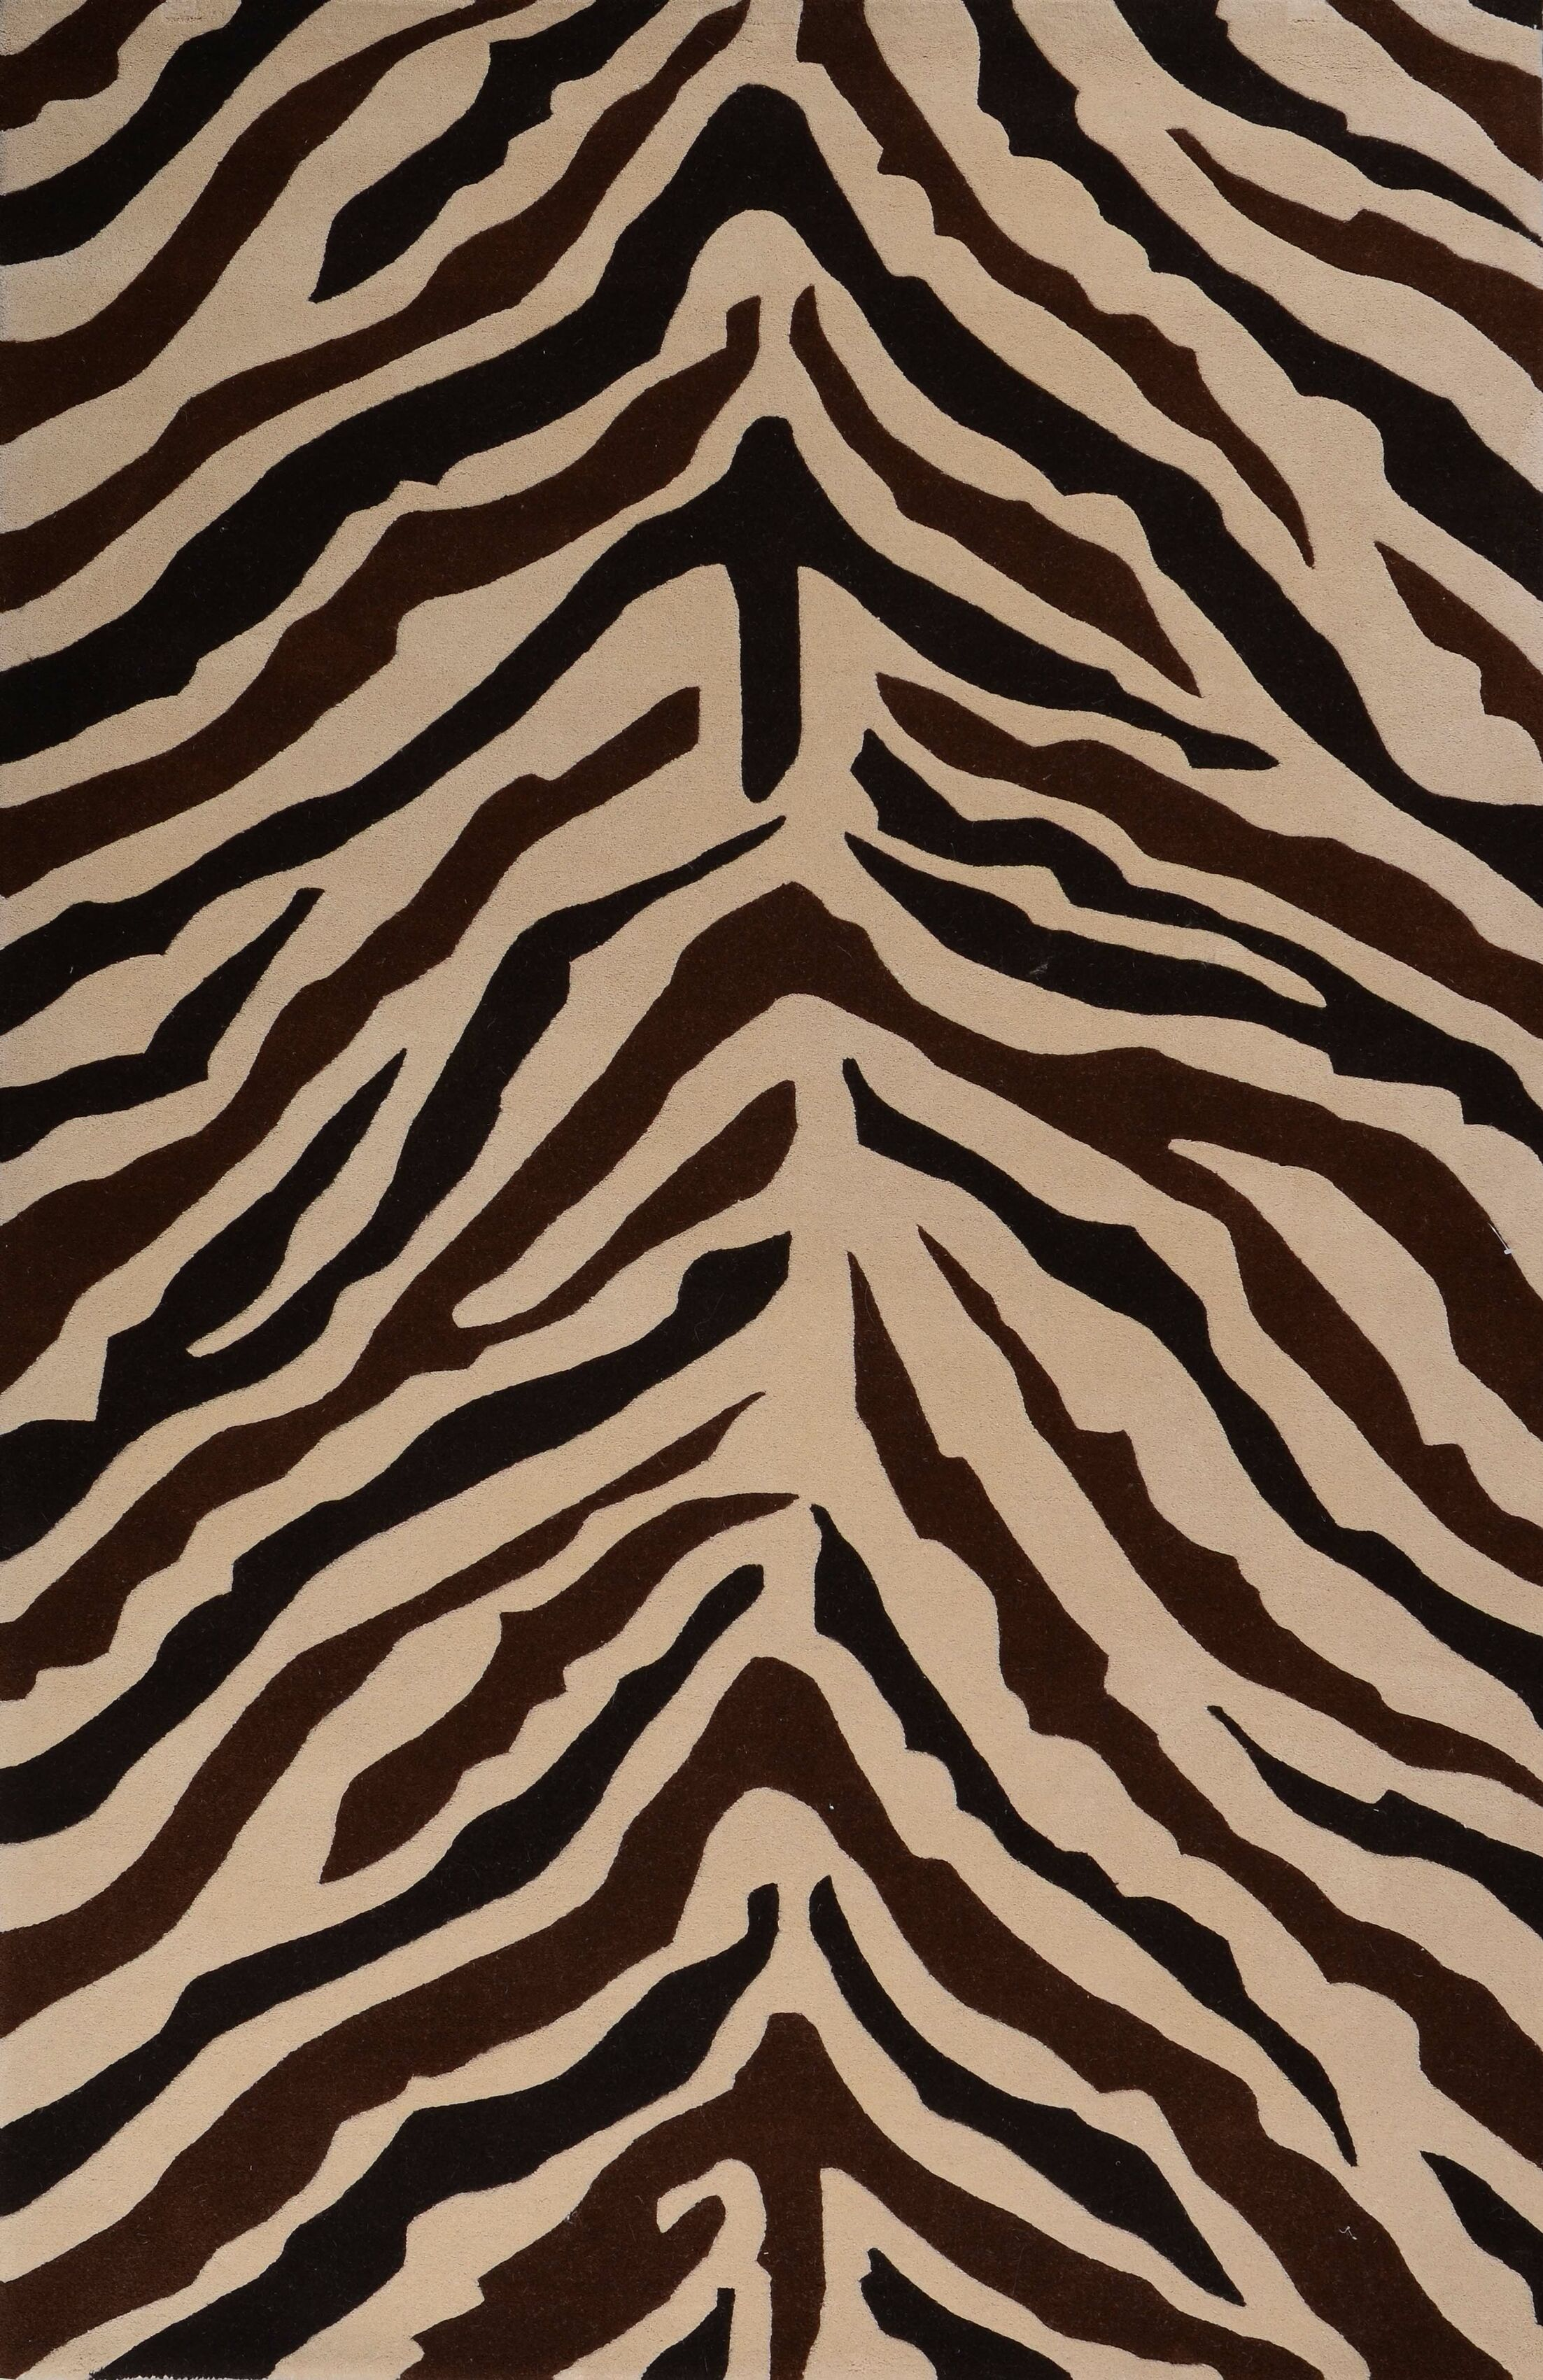 Penley Zebra Rug Rug Size: 5' x 8'